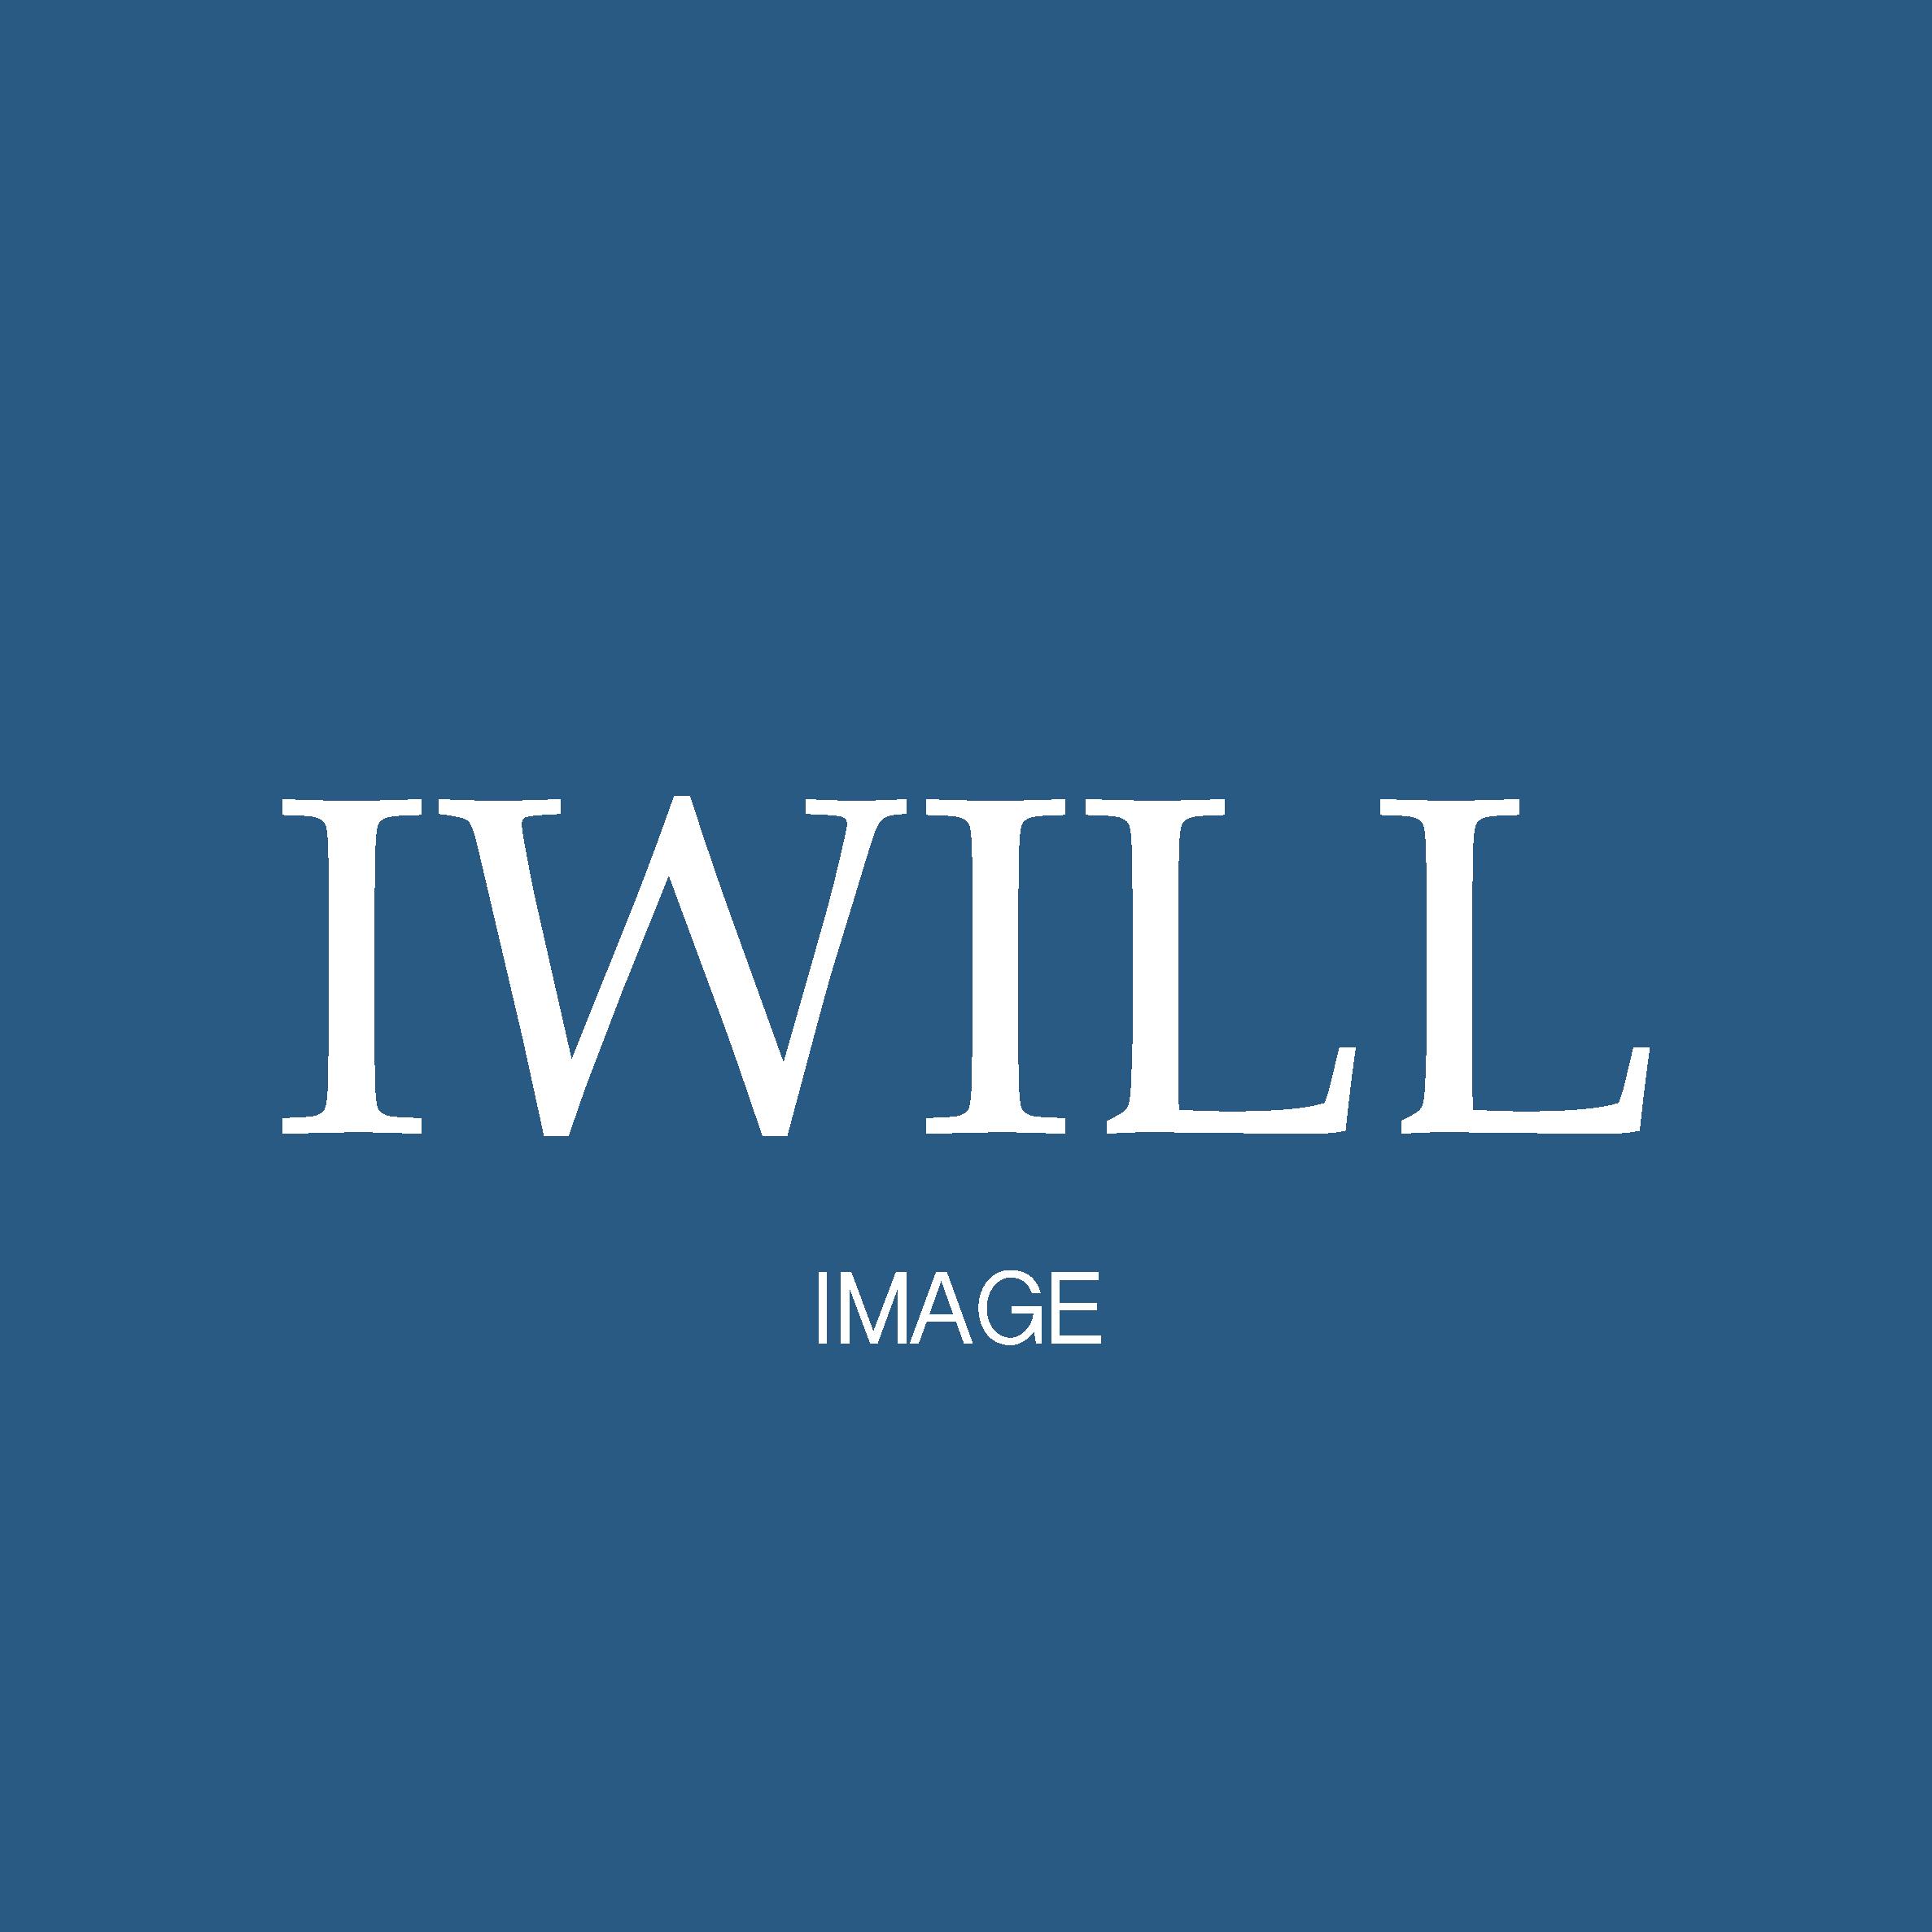 IWILL IMAGE